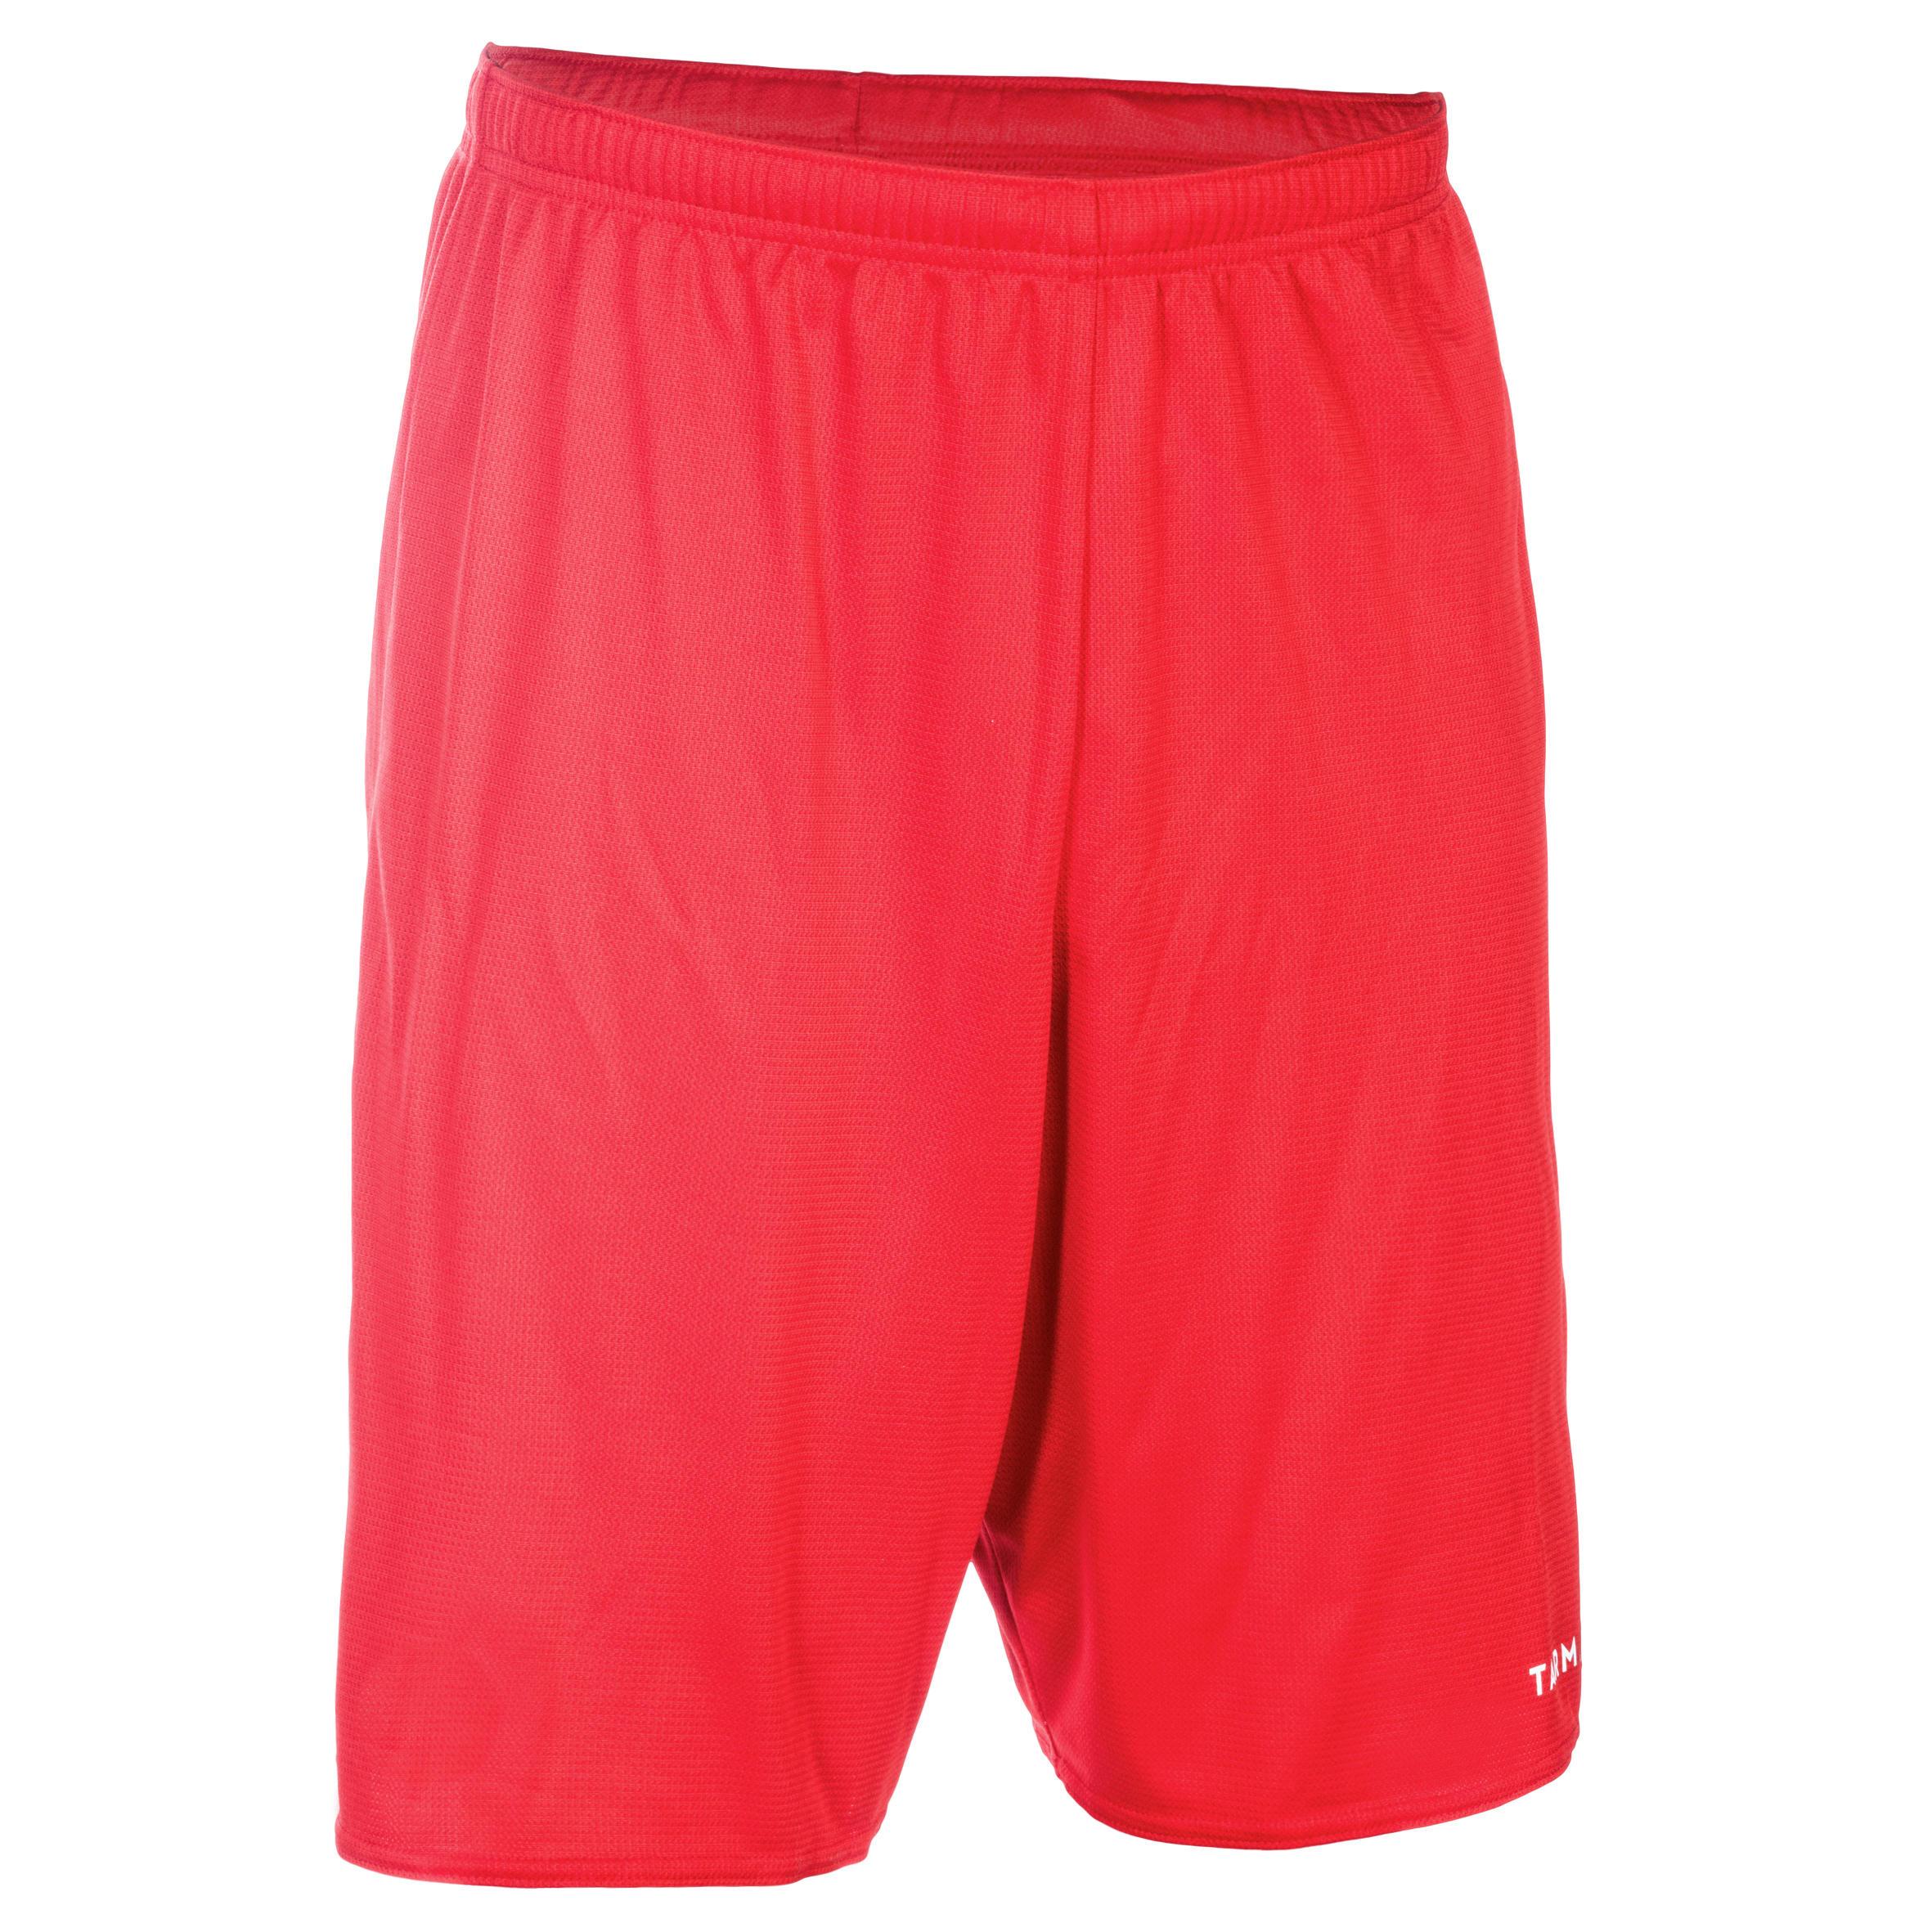 Basketballshorts SH100 Erwachsene rot   Sportbekleidung > Sporthosen > Basketballshorts   Rot - Weiß   Tarmak